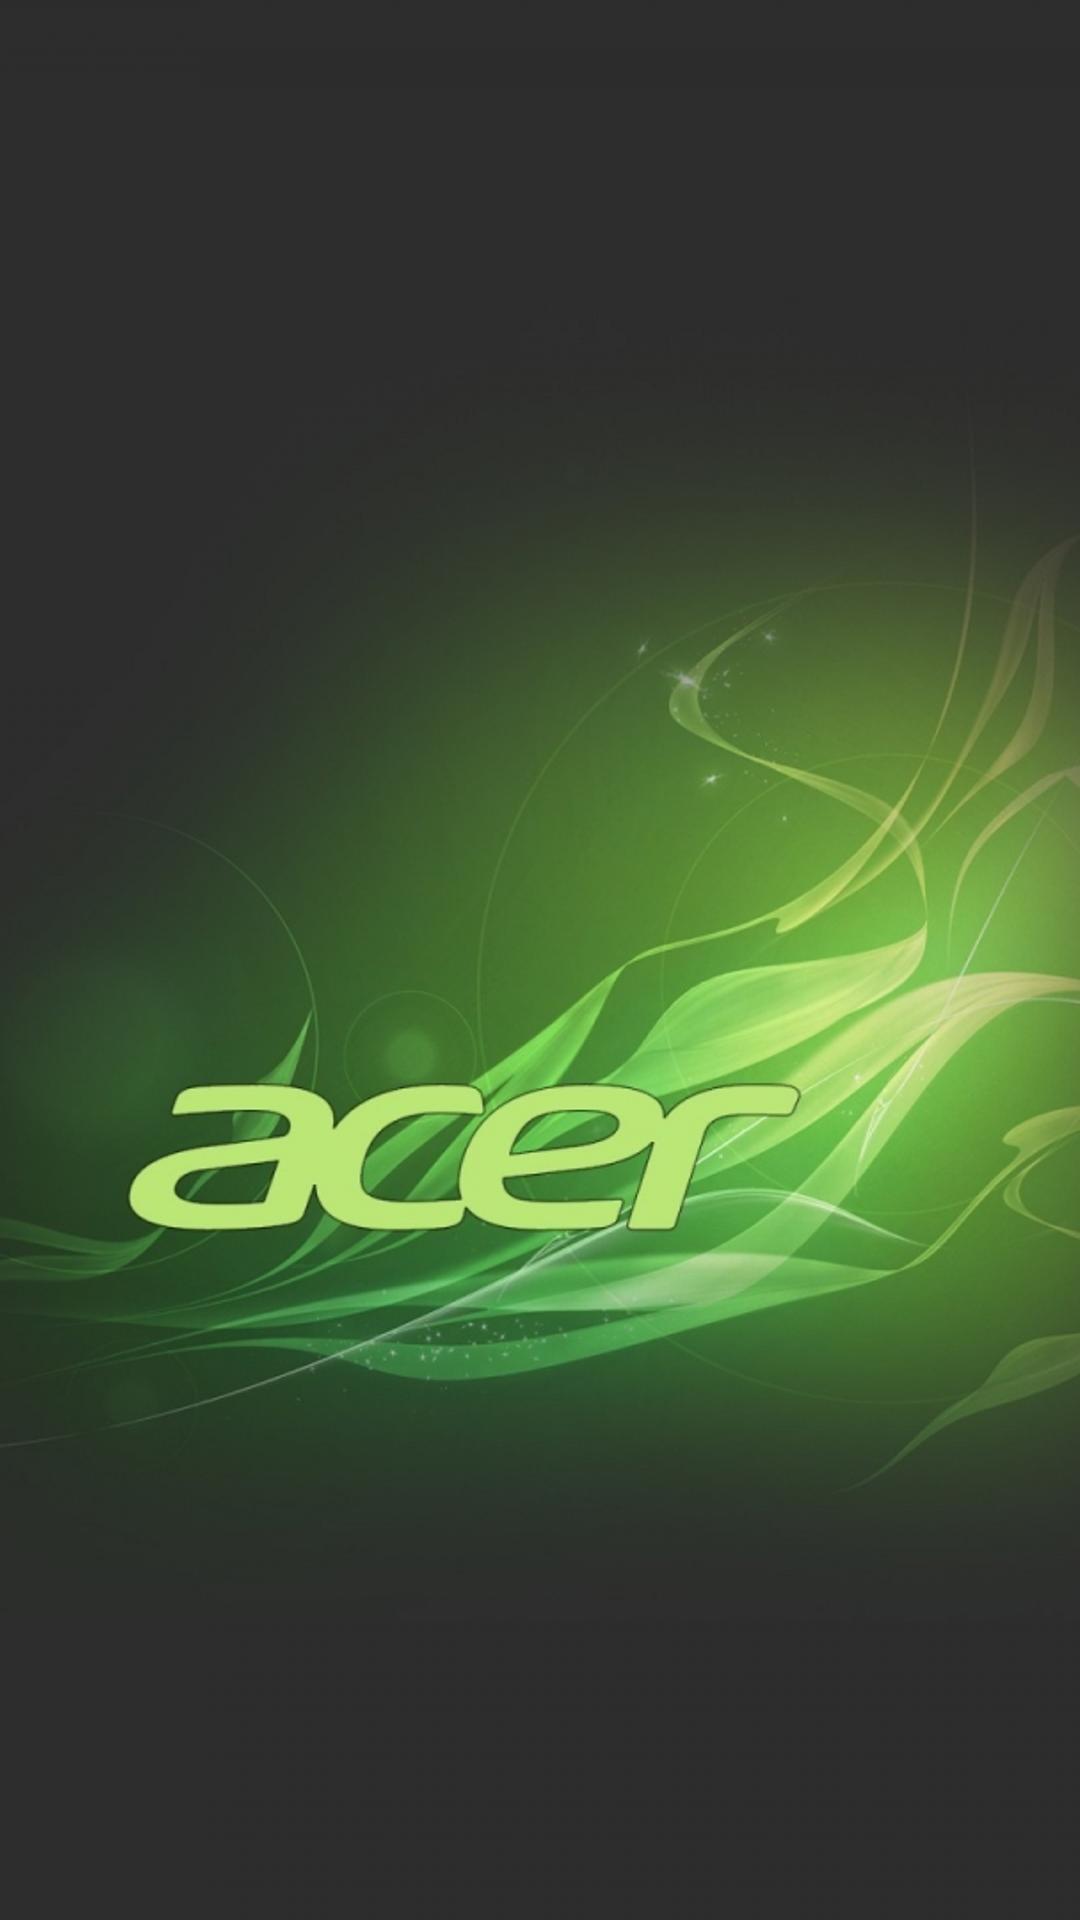 Green And Black Acer Logo Wallpaper Wallpaper Download